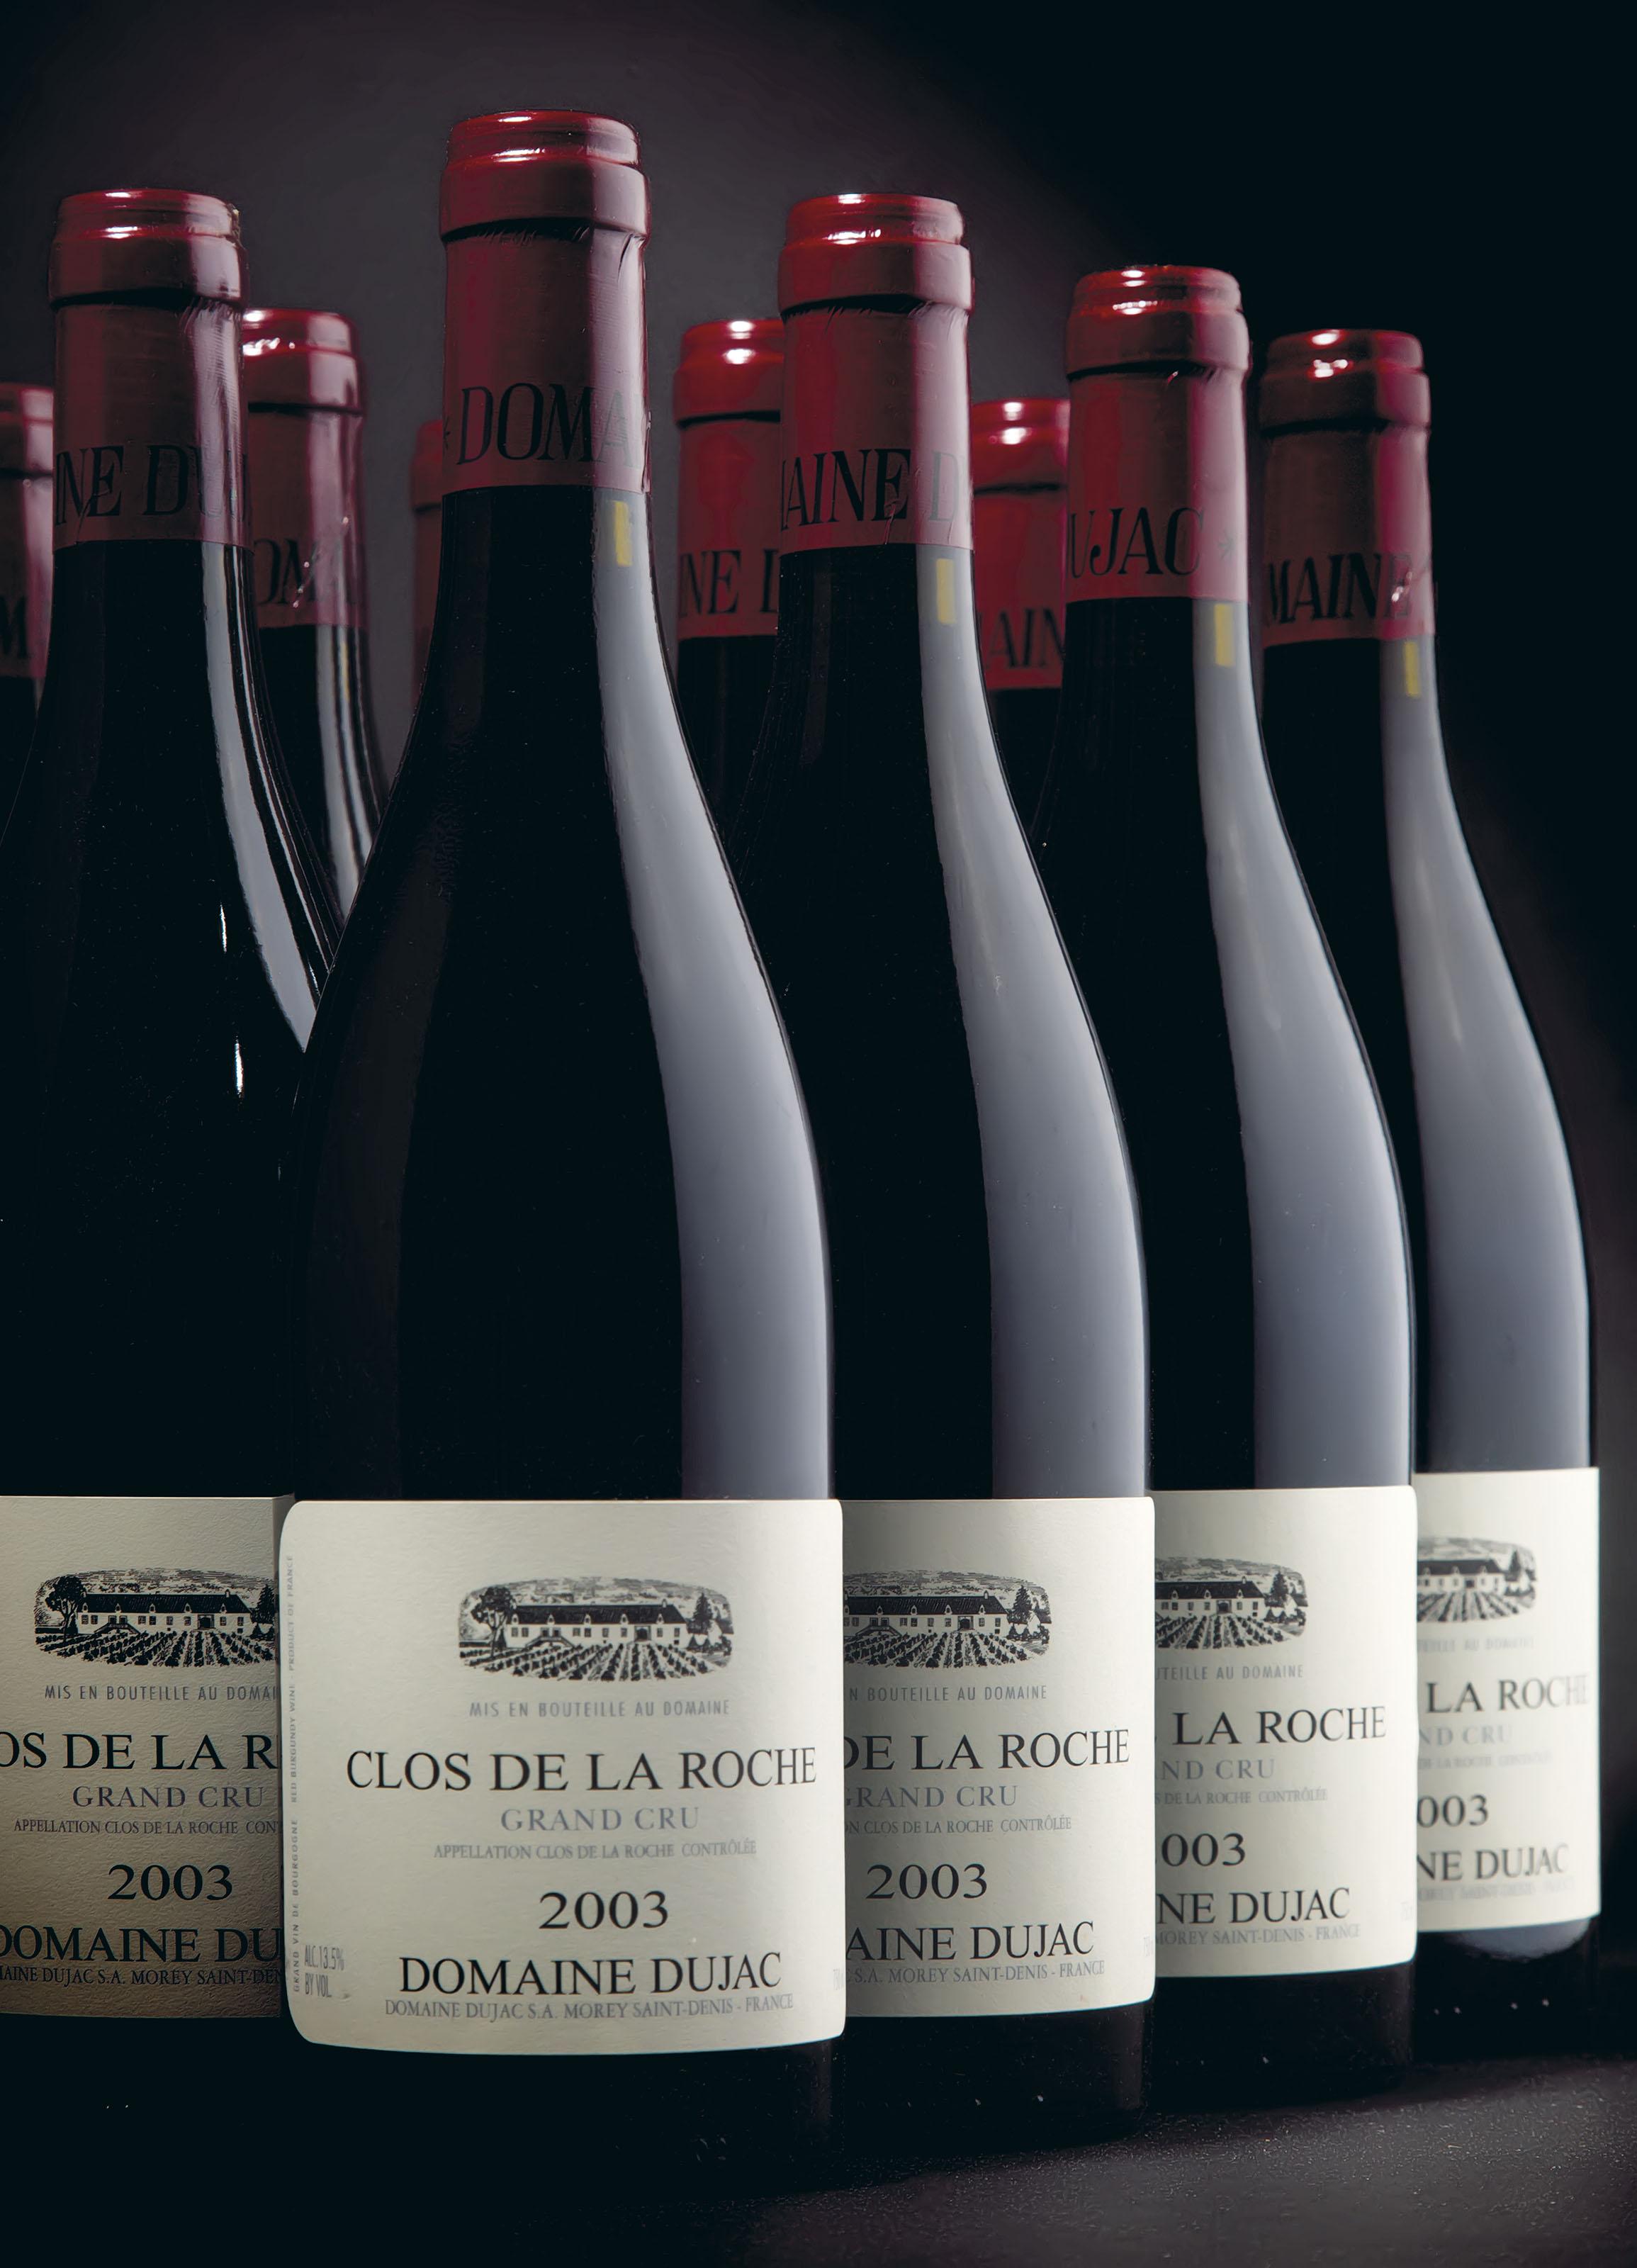 Domaine Dujac Clos de la Roche 2003